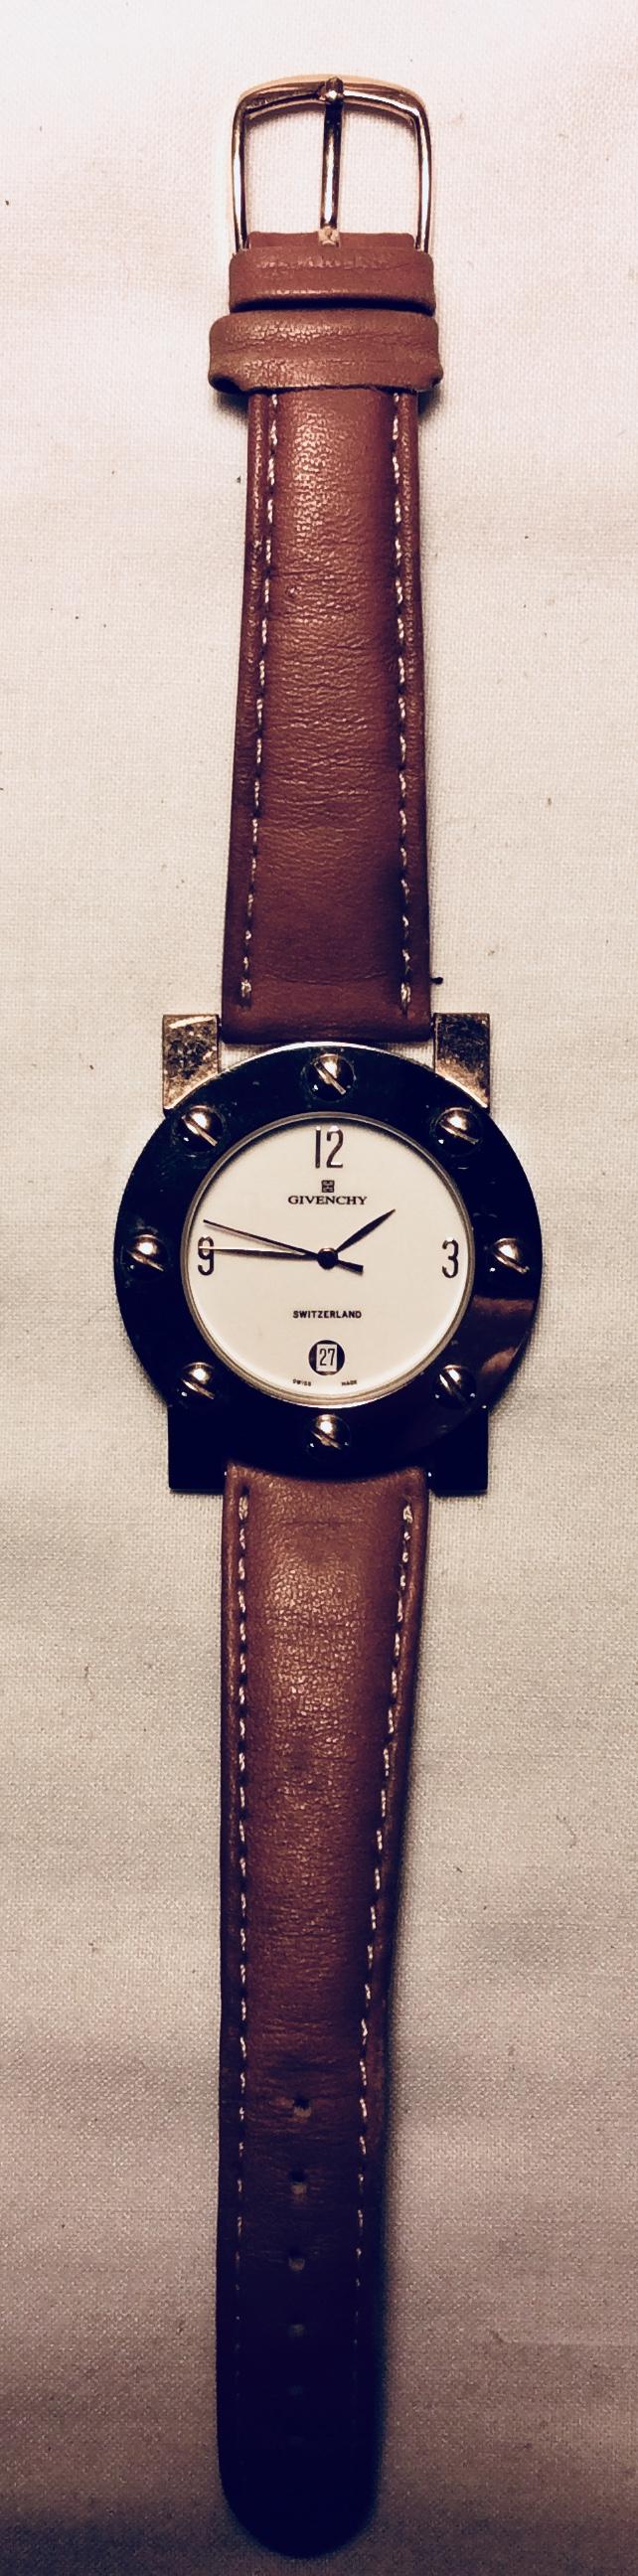 Circular watch